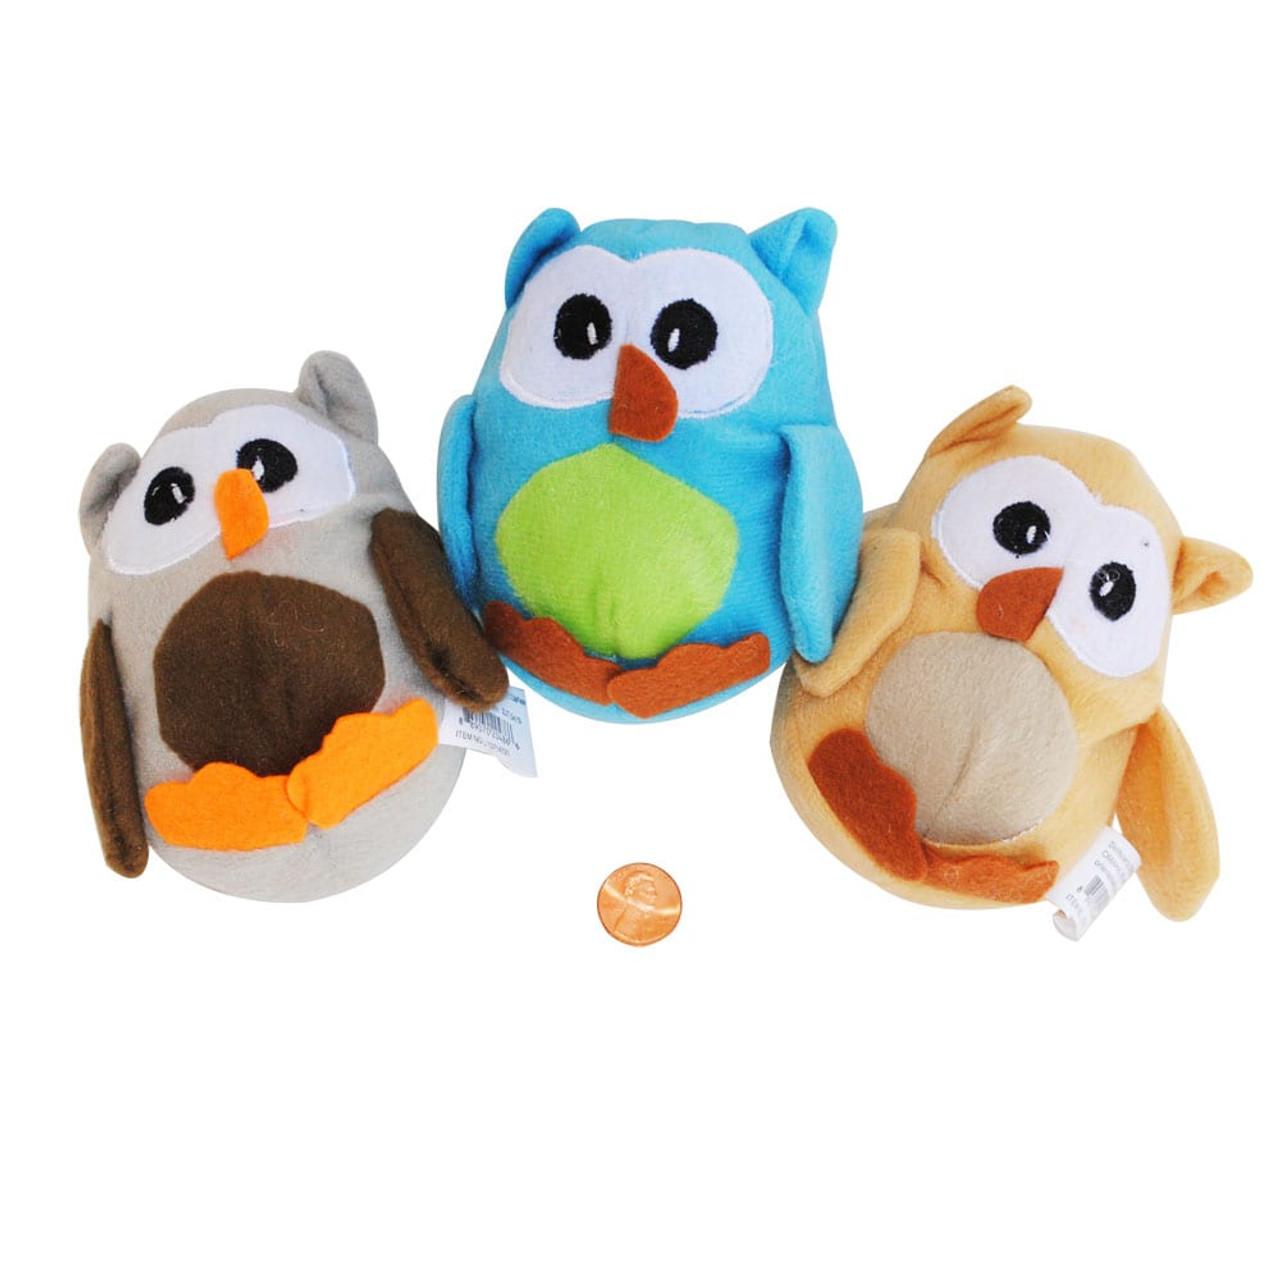 Mini Stuffed Owl Mini Stuffed Prize